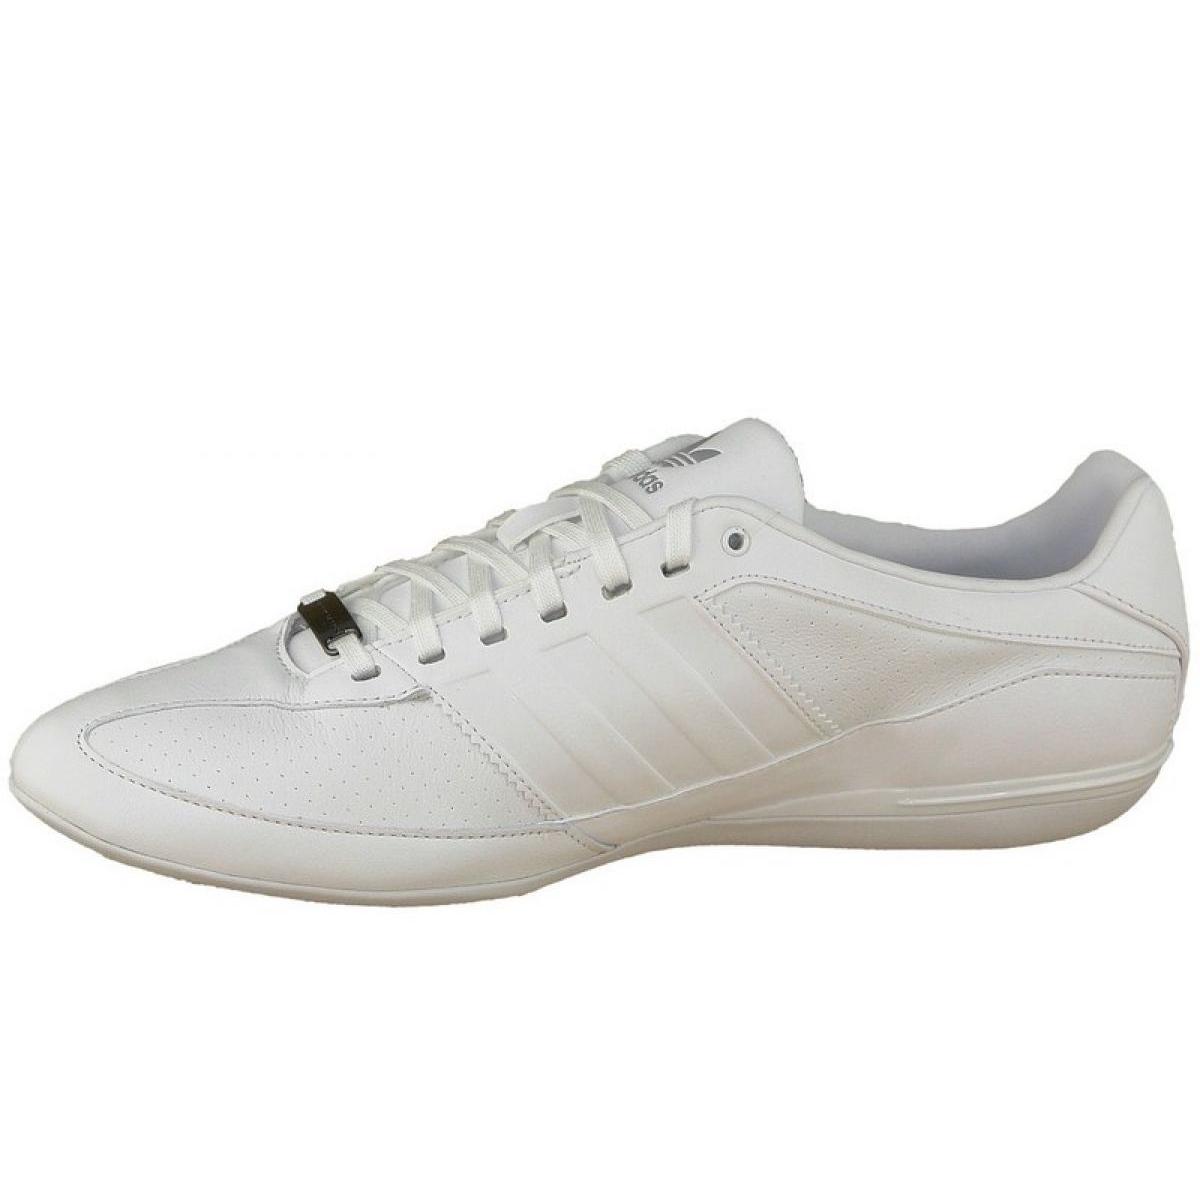 meilleure sélection 4db76 084ae White Shoes adidas Porsche Typ 64 M Q23135